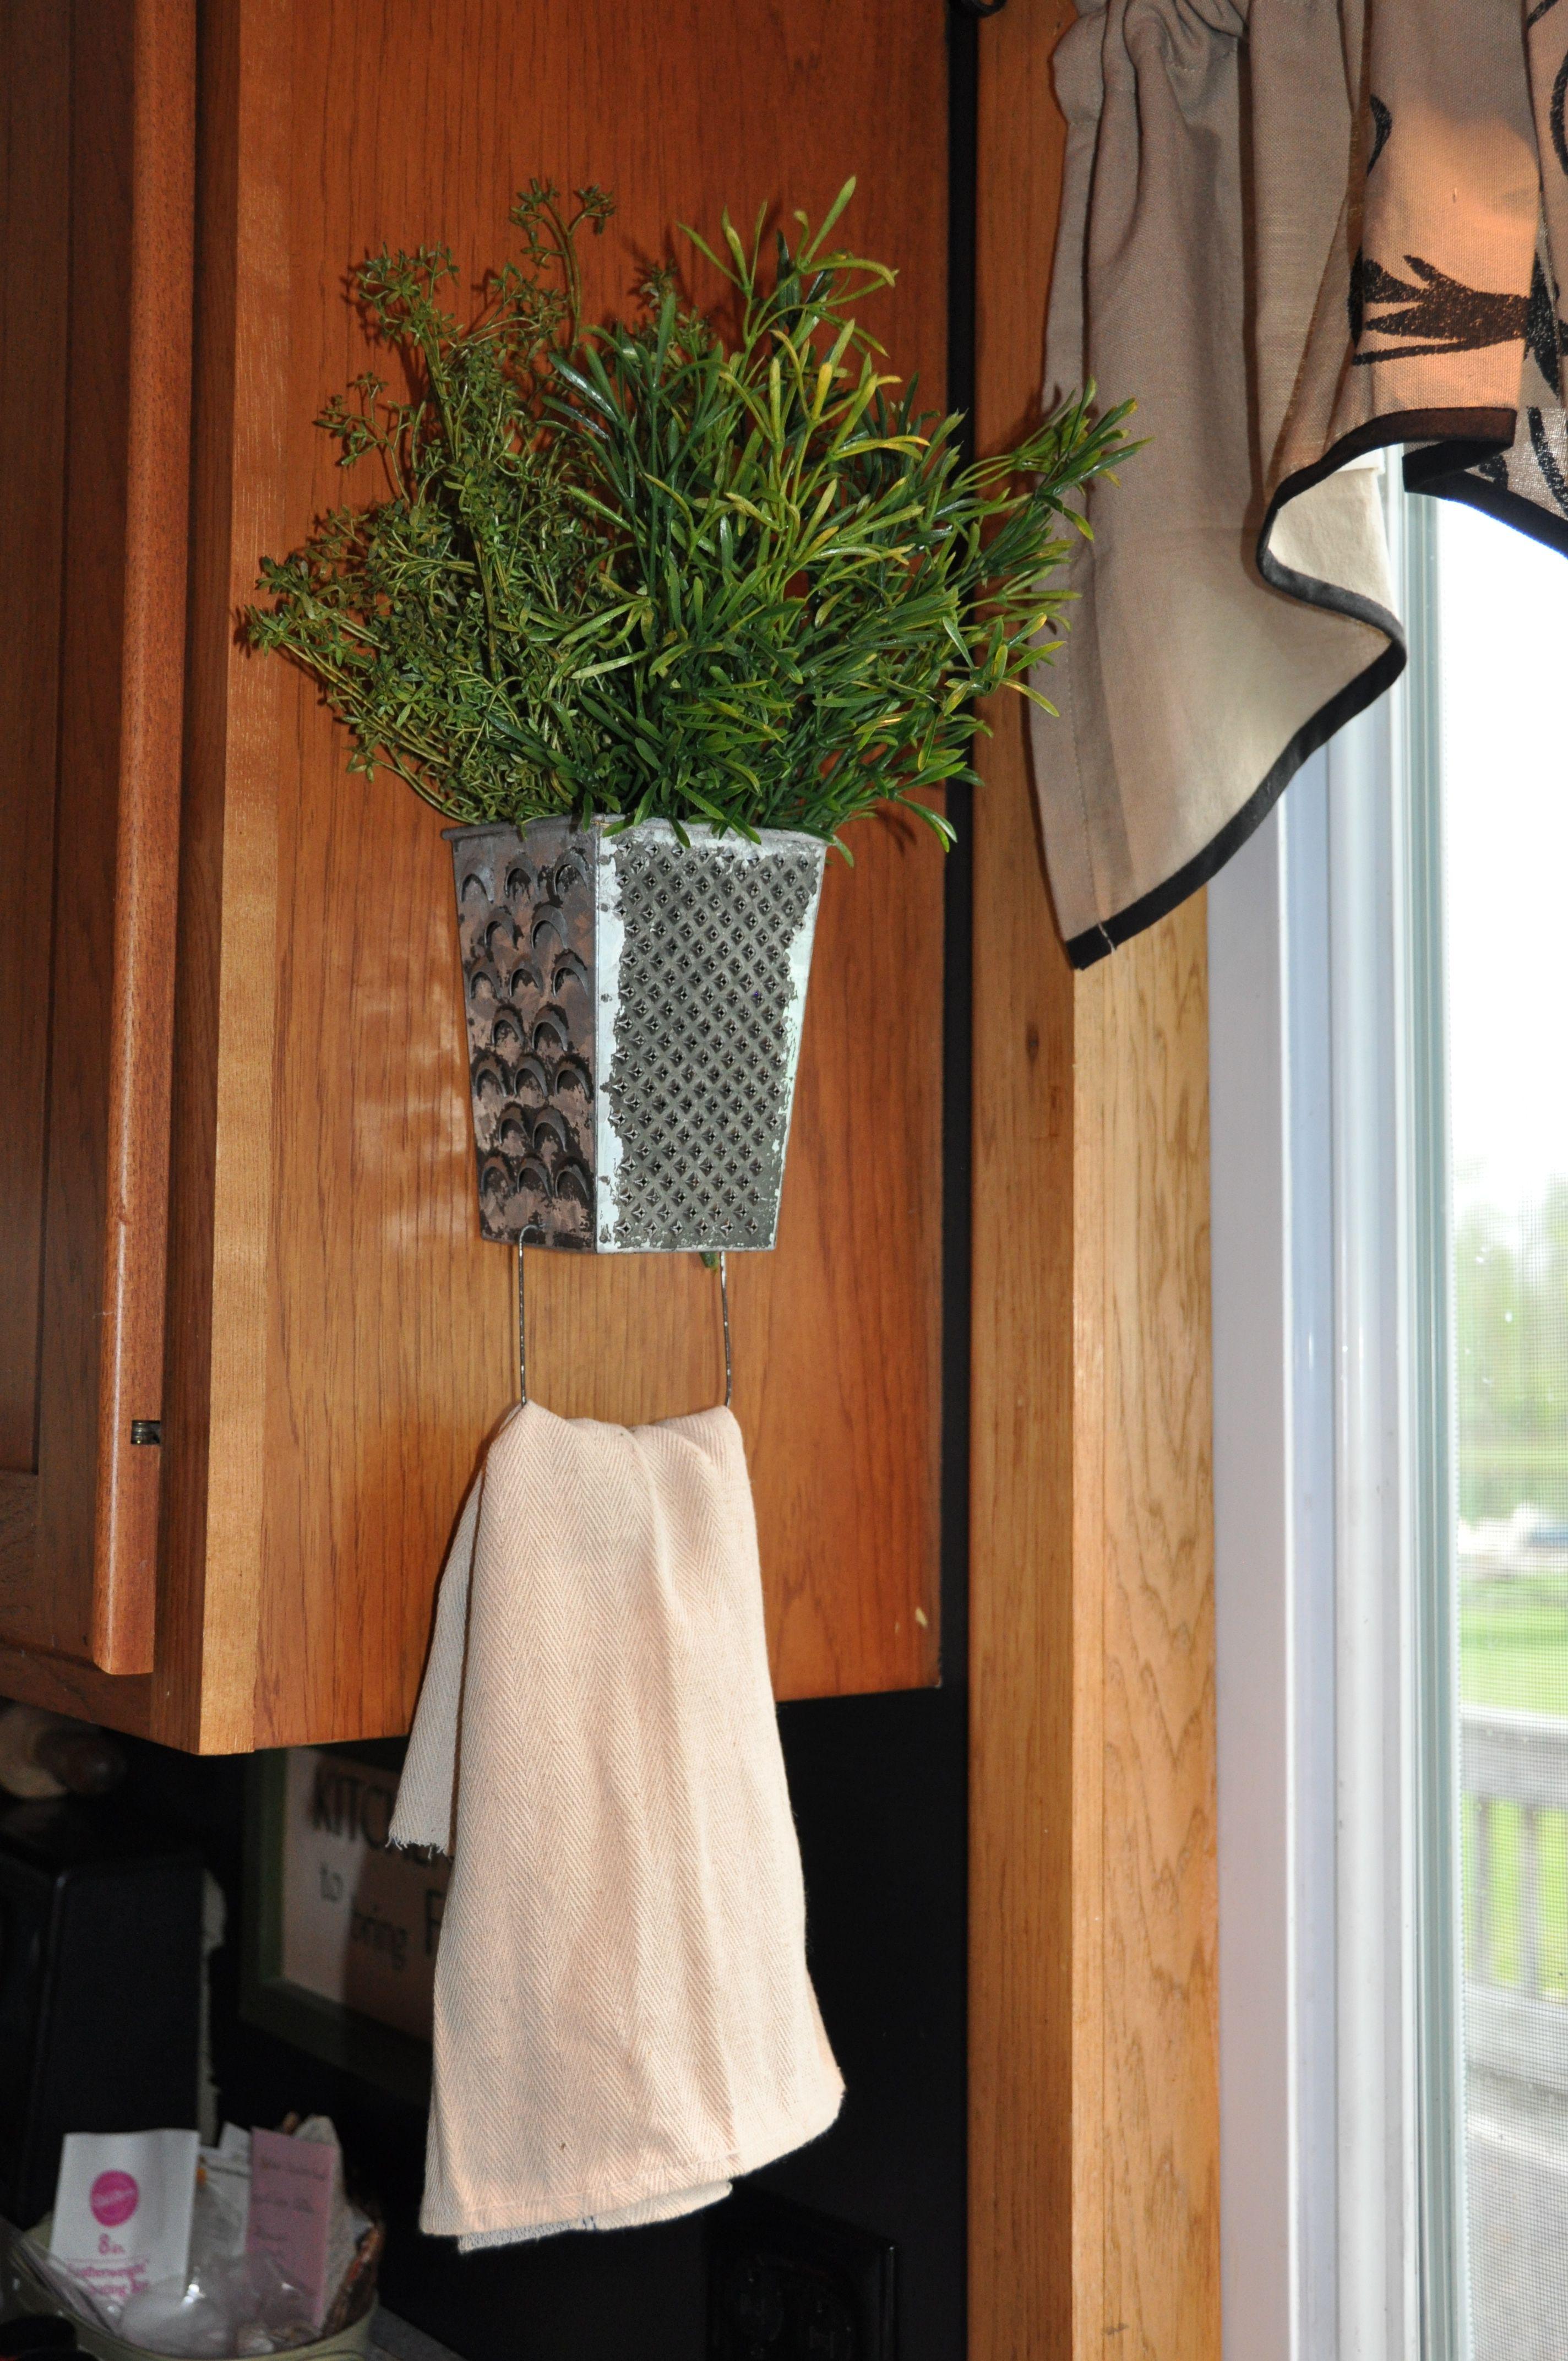 Idee fai da te: Riciclo - Recycle | Idee Per Mobili e Cucina | Pinterest